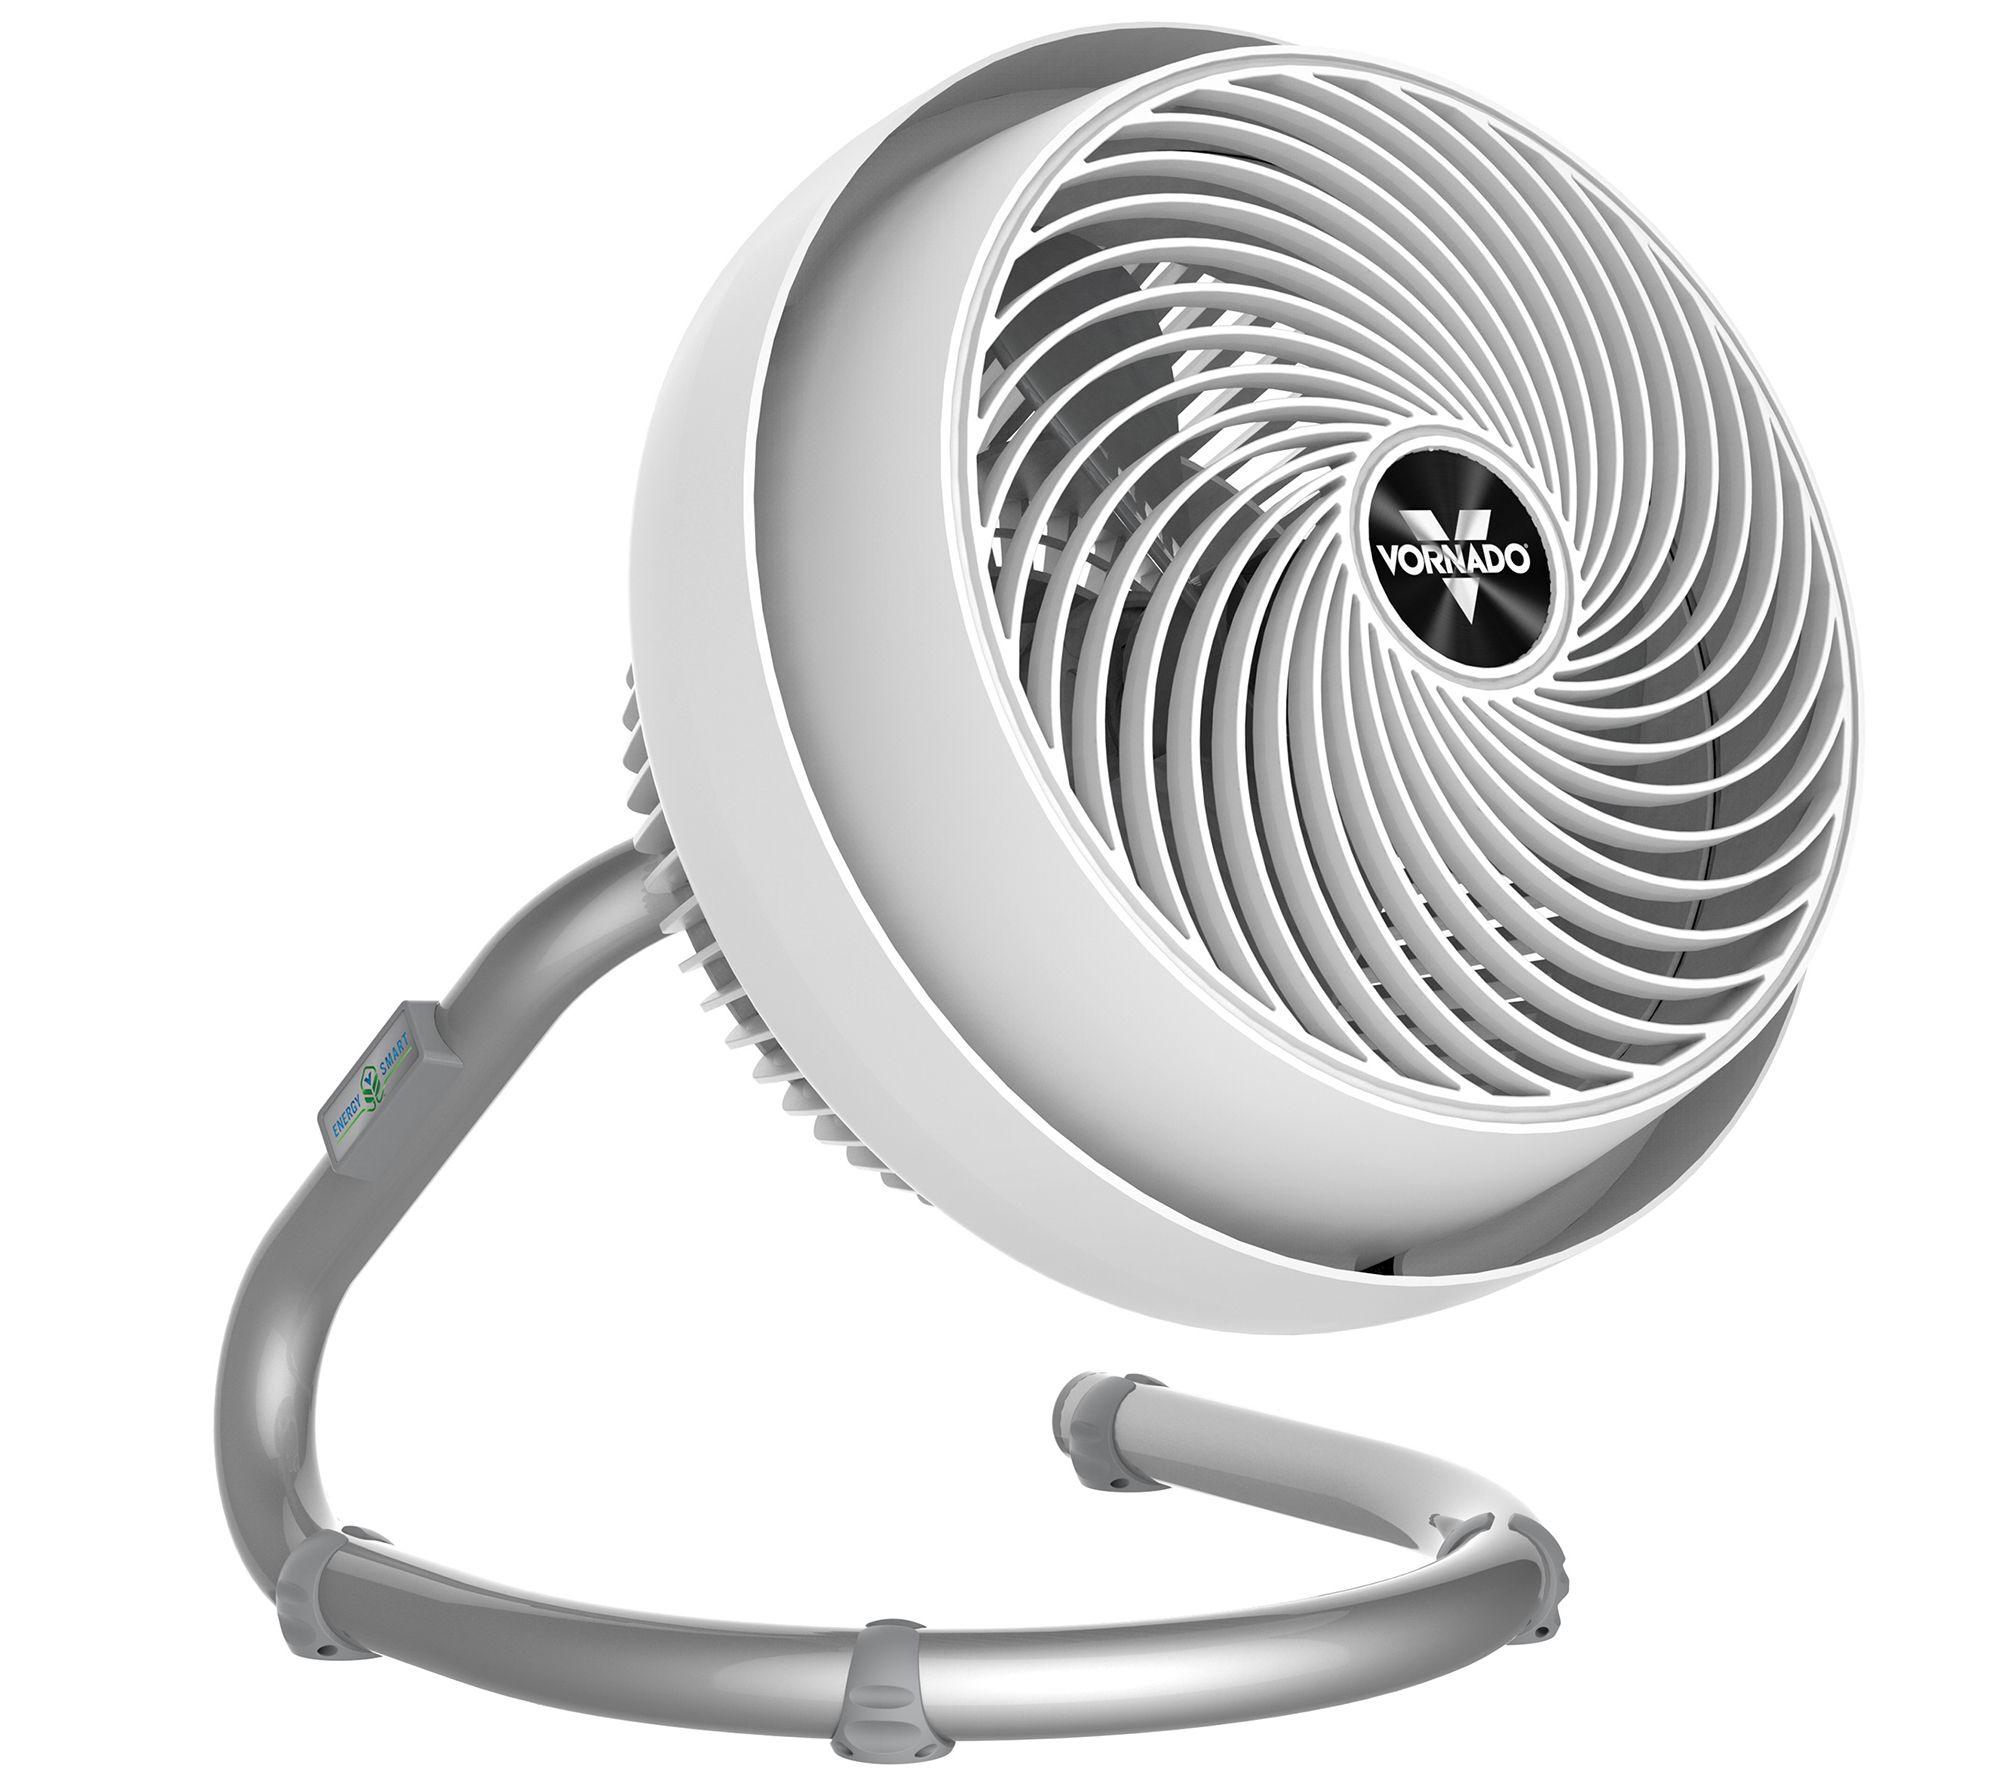 Vornado Air Circulators Clip On : Vornado dc whole room air circulator — qvc